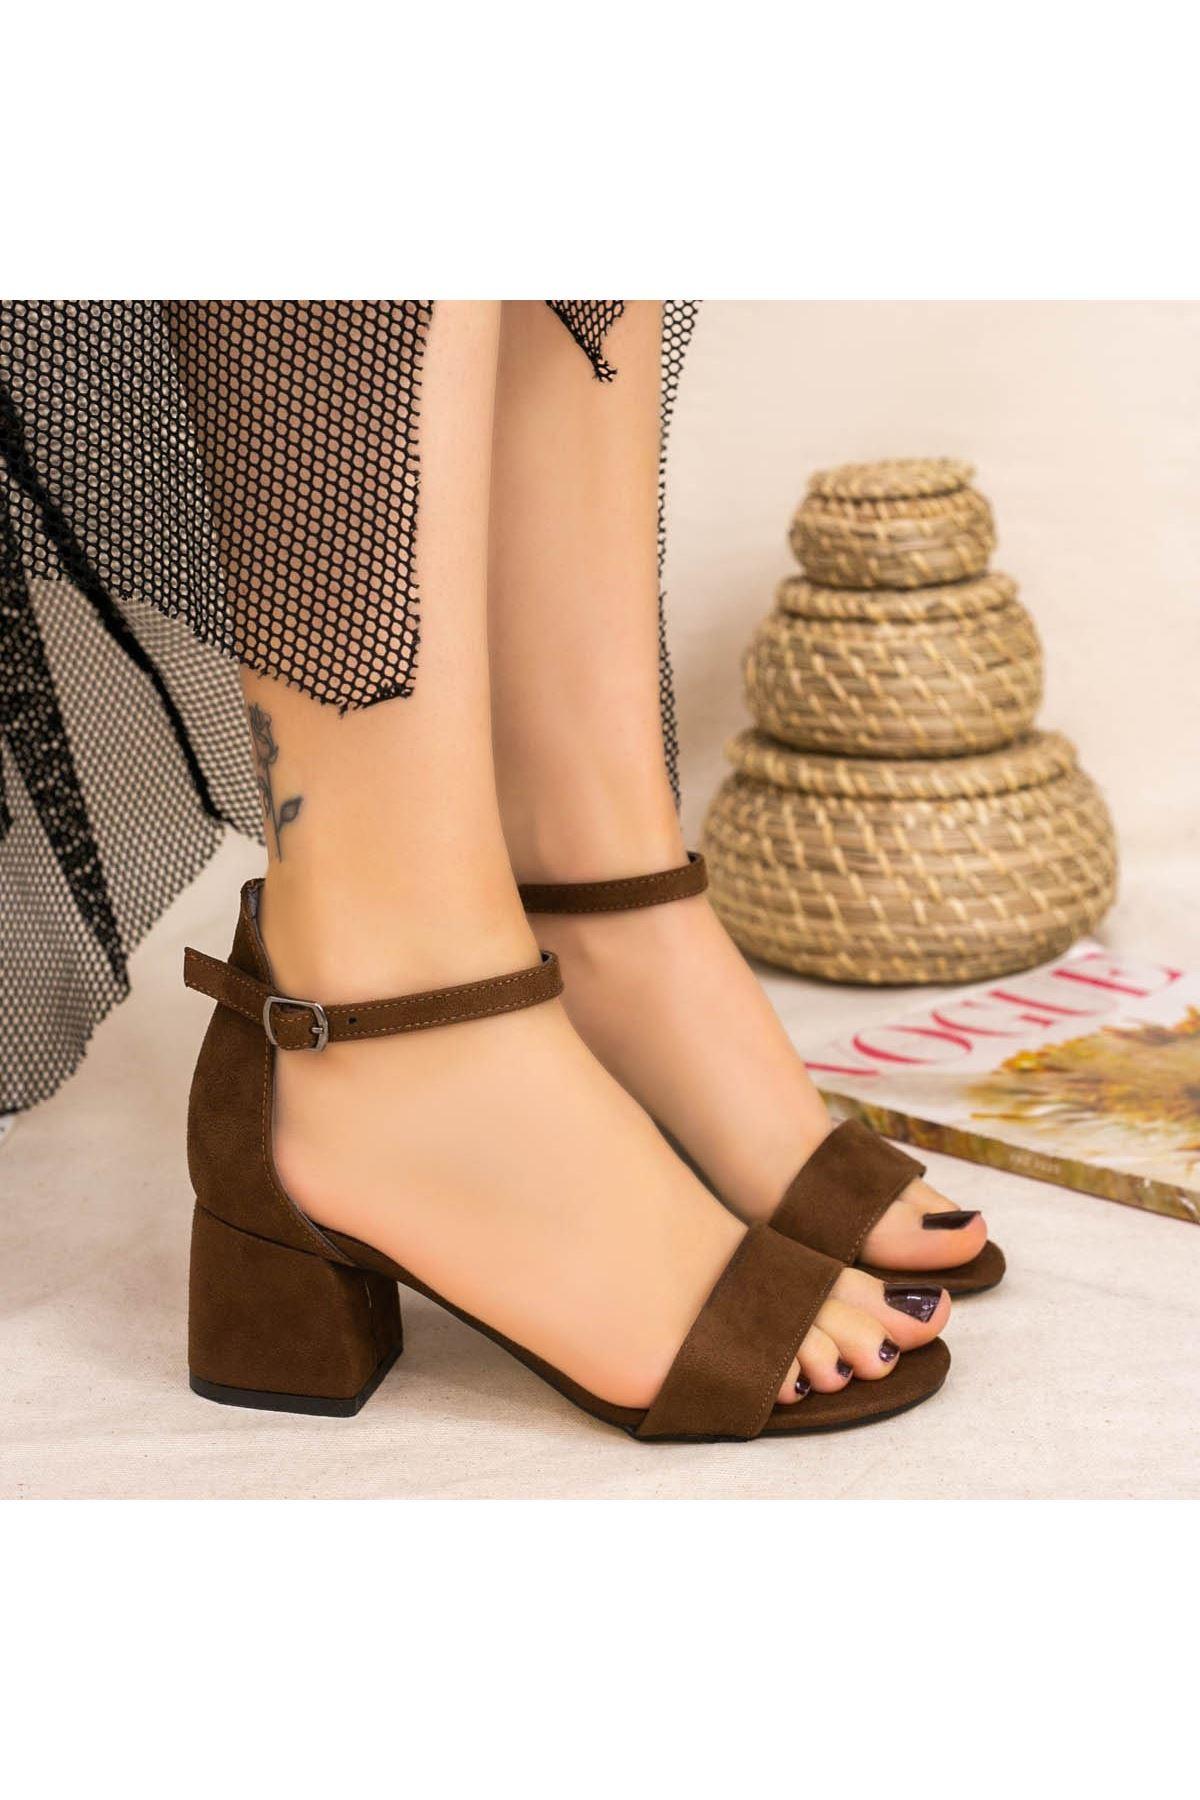 Epon Kahverengi Süet Tek Bant Topuklu Ayakkabı